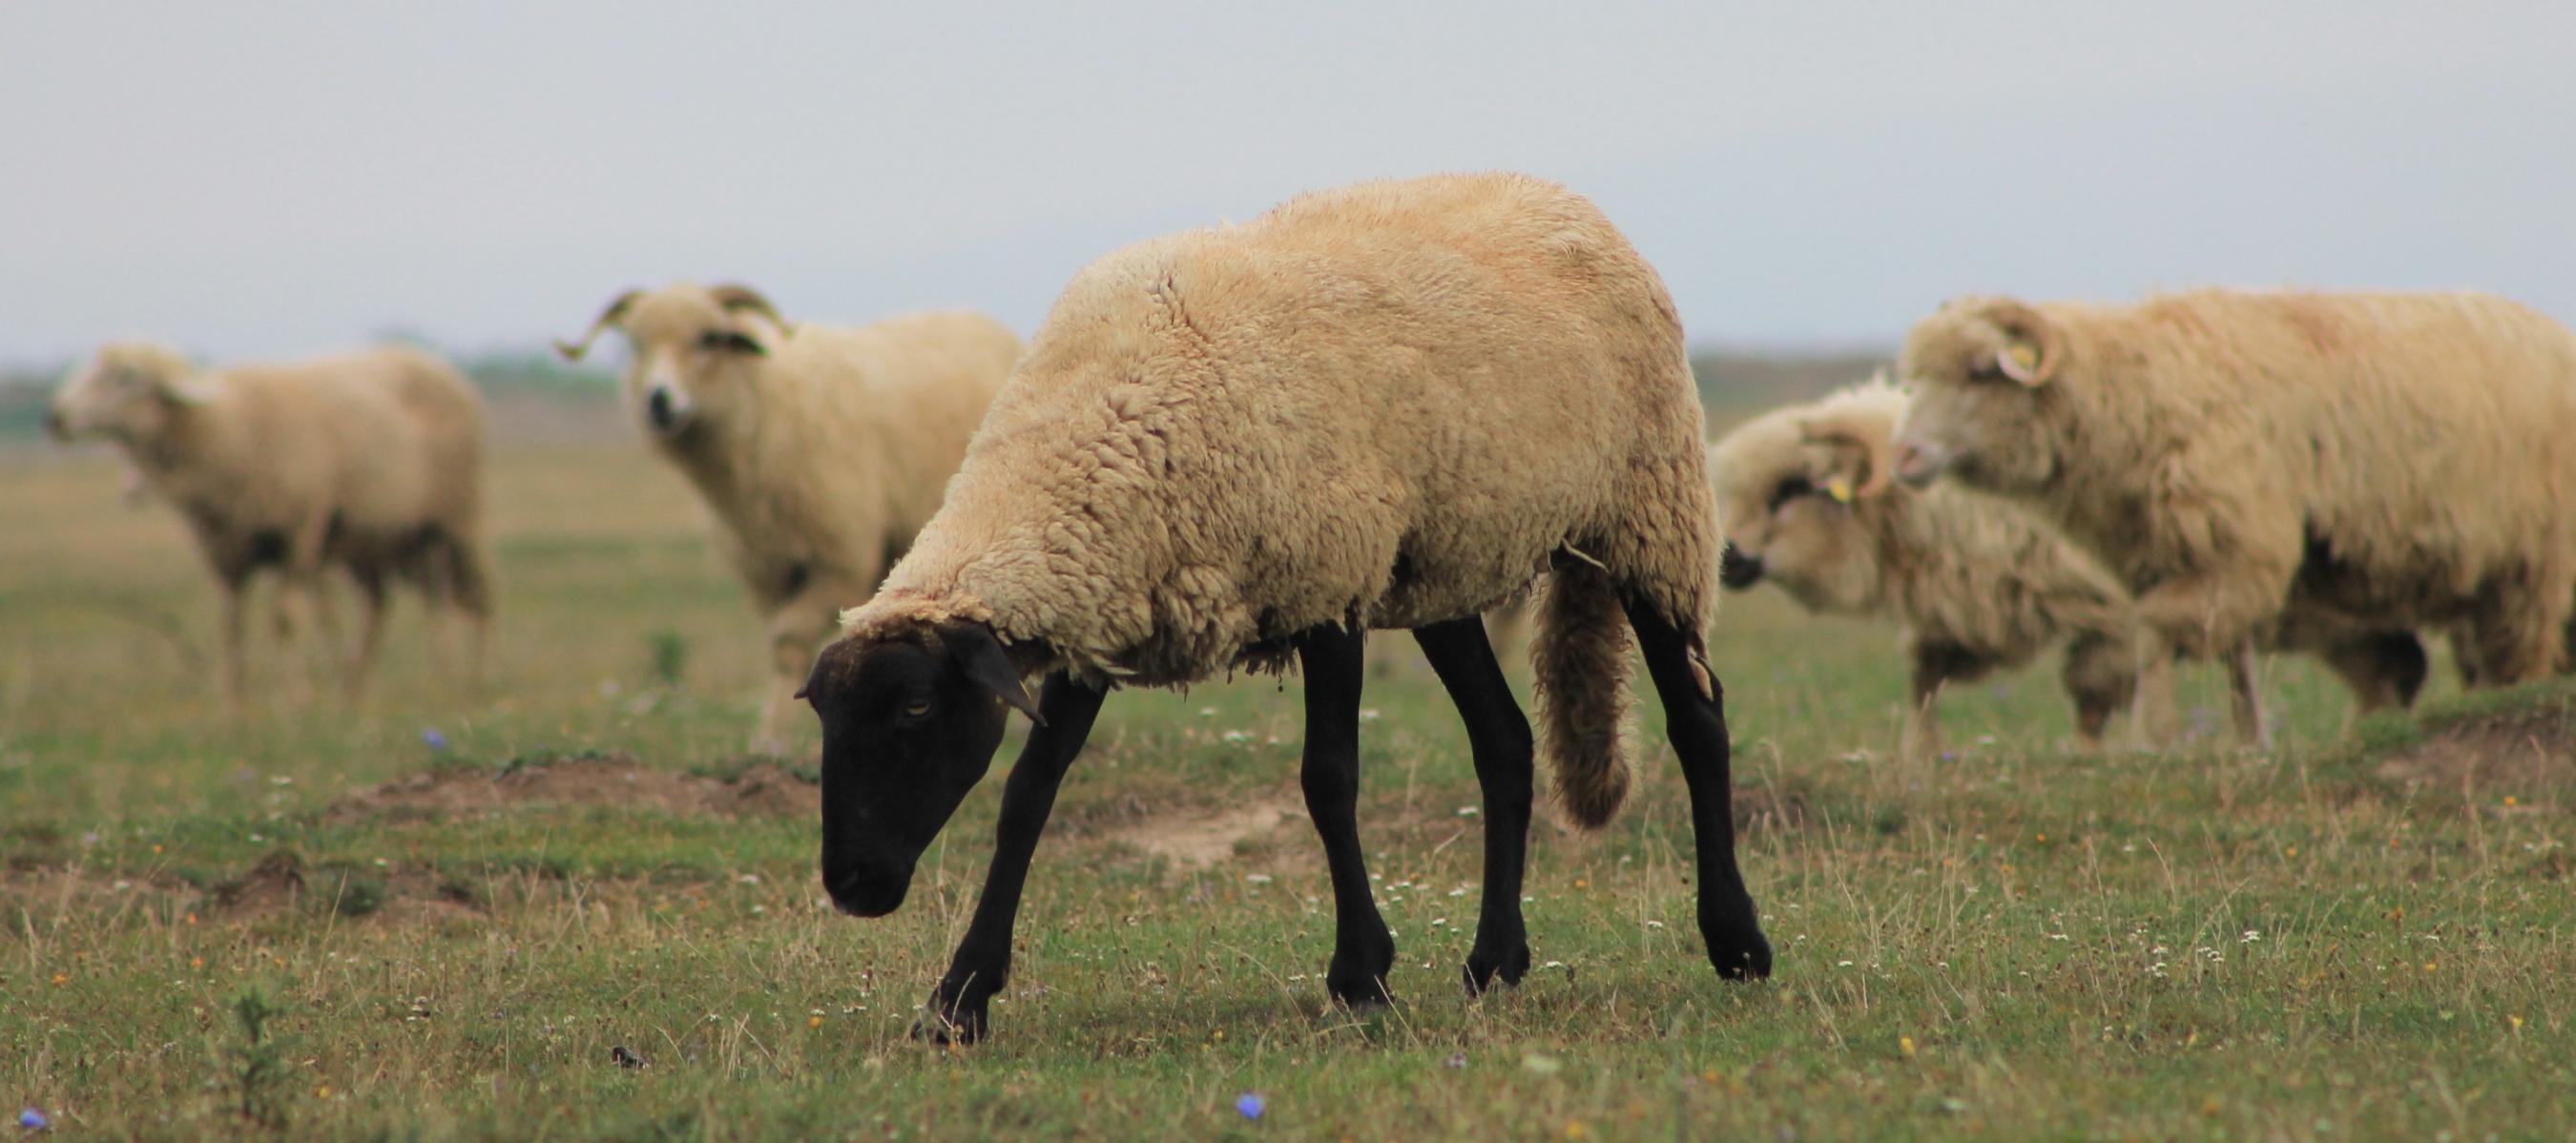 Romanian sheep - photo taken from the Moeke Yarns website here